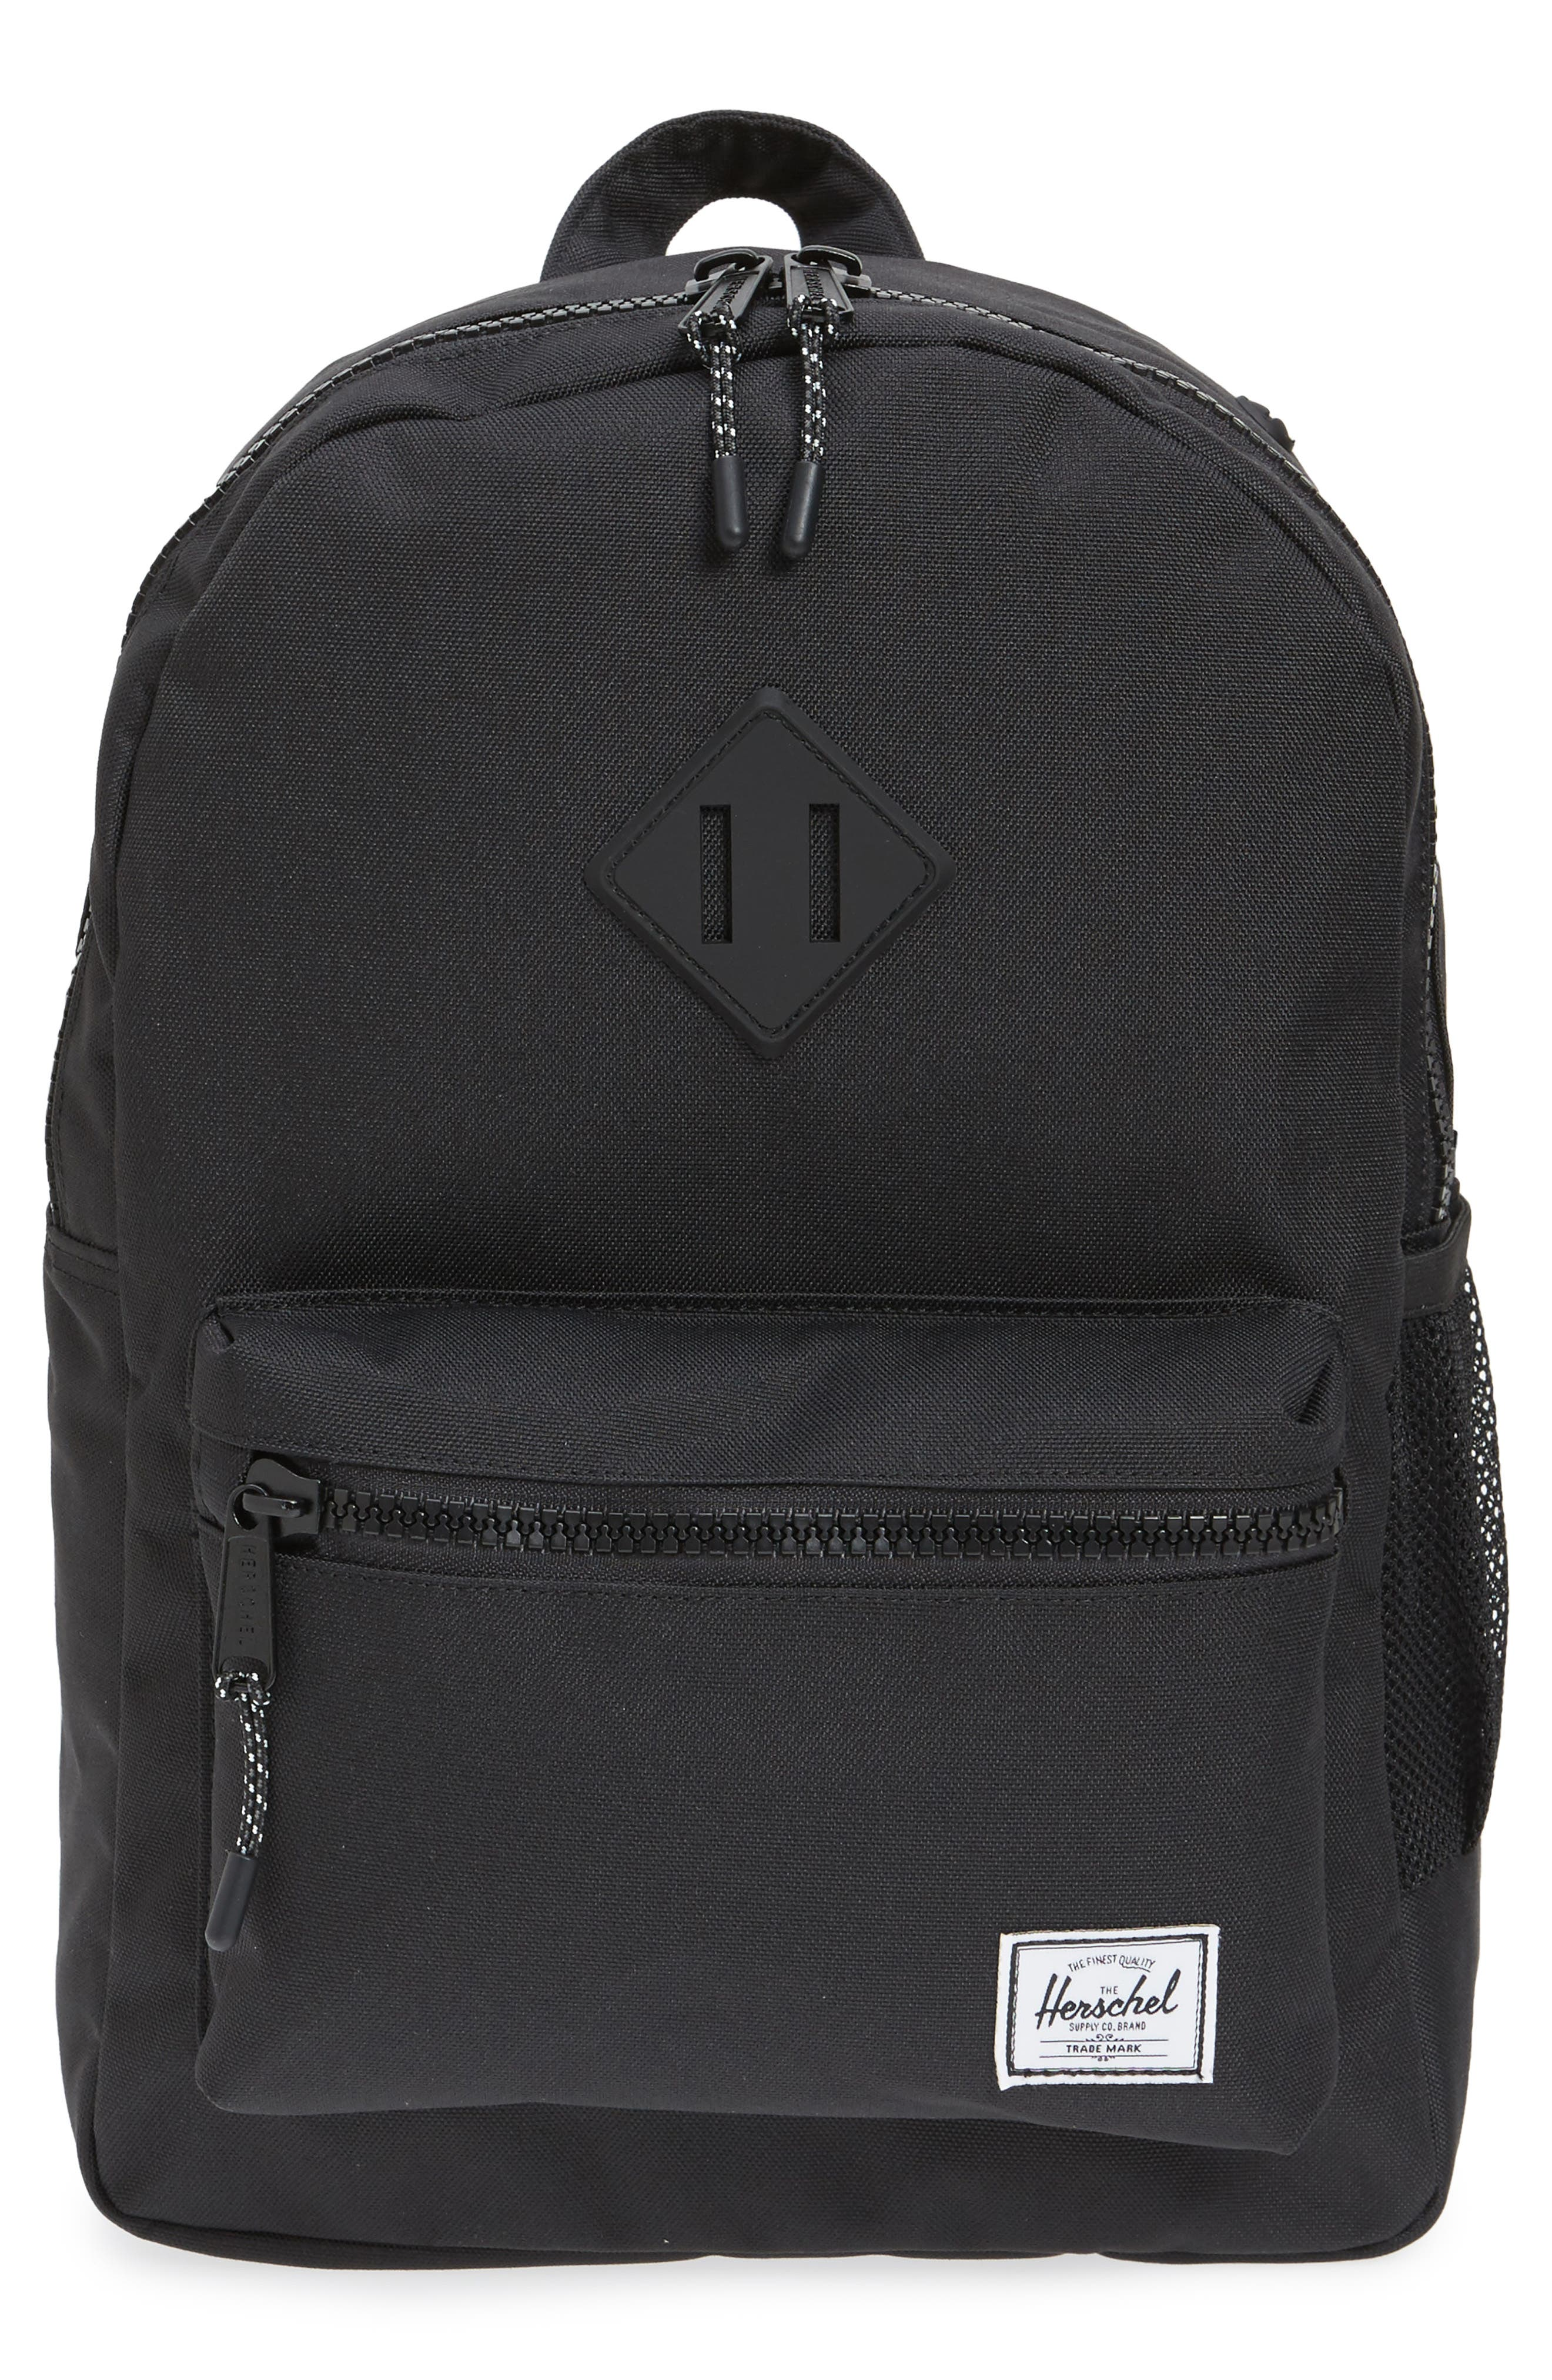 Alternate Image 1 Selected - Herschel Supply Co. Heritage Backpack (Kids)